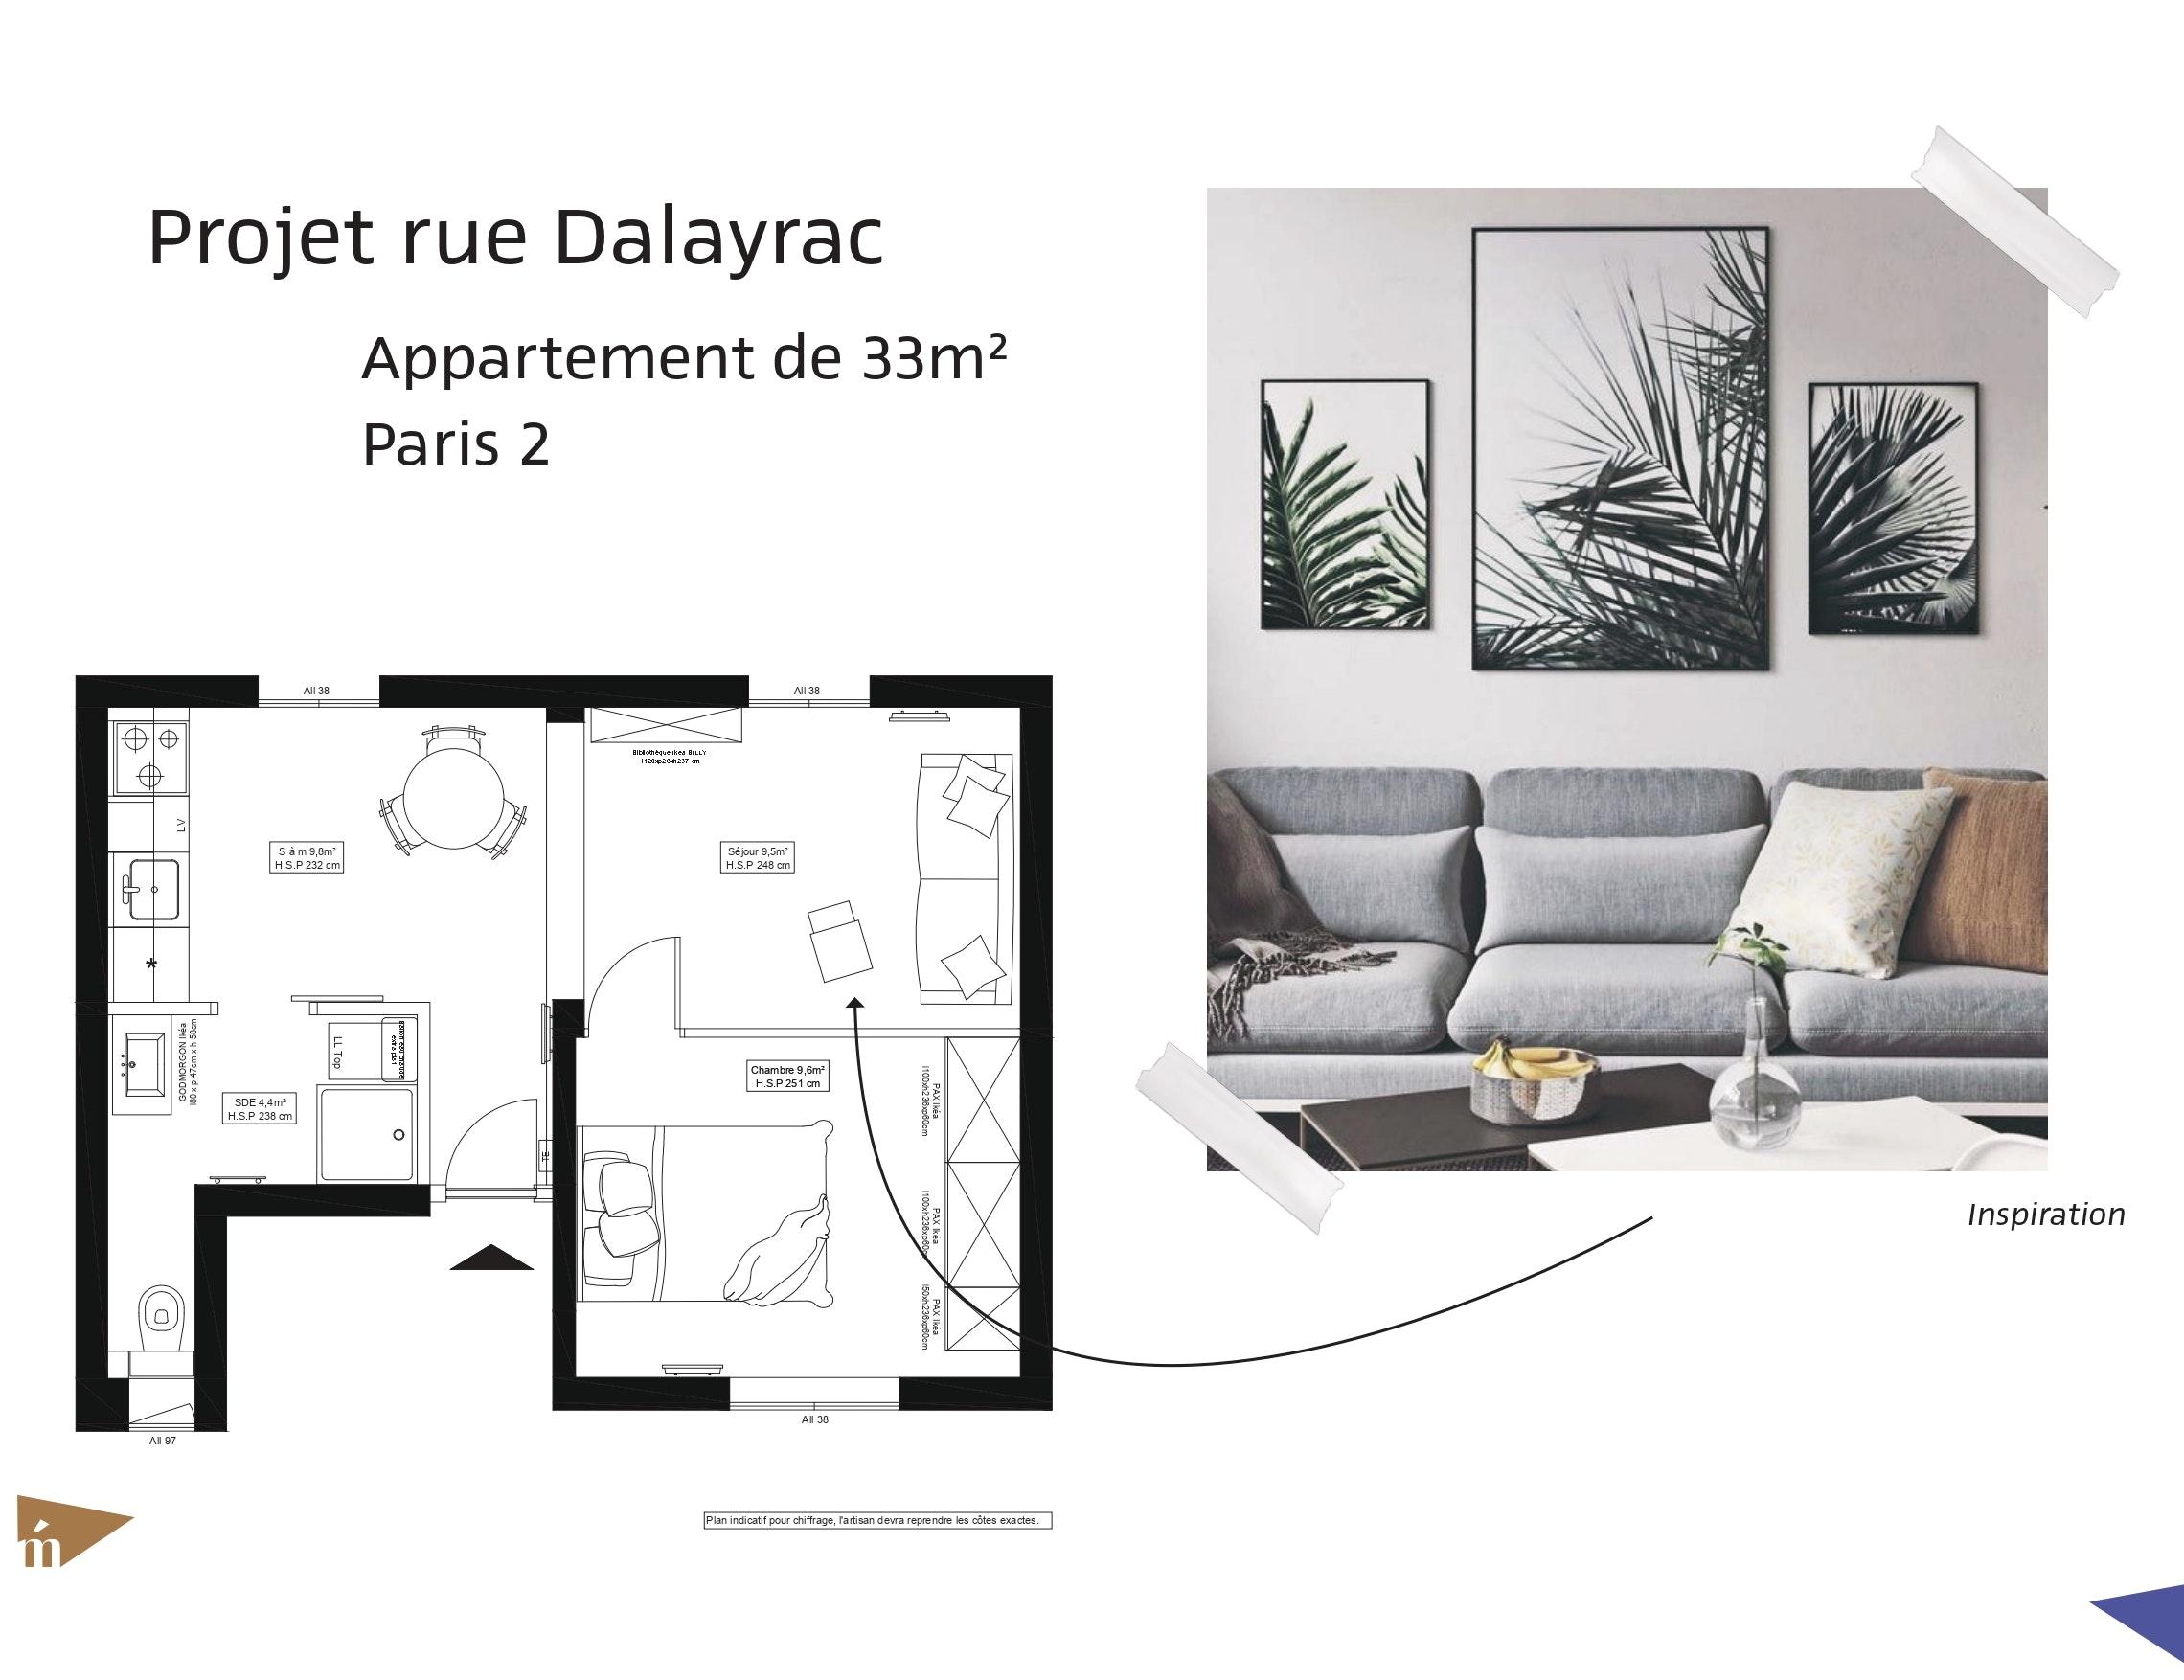 photo Projet rue Dalayrac - T2 33 m² - Paris 2 Léa Mast - Architecte hemea